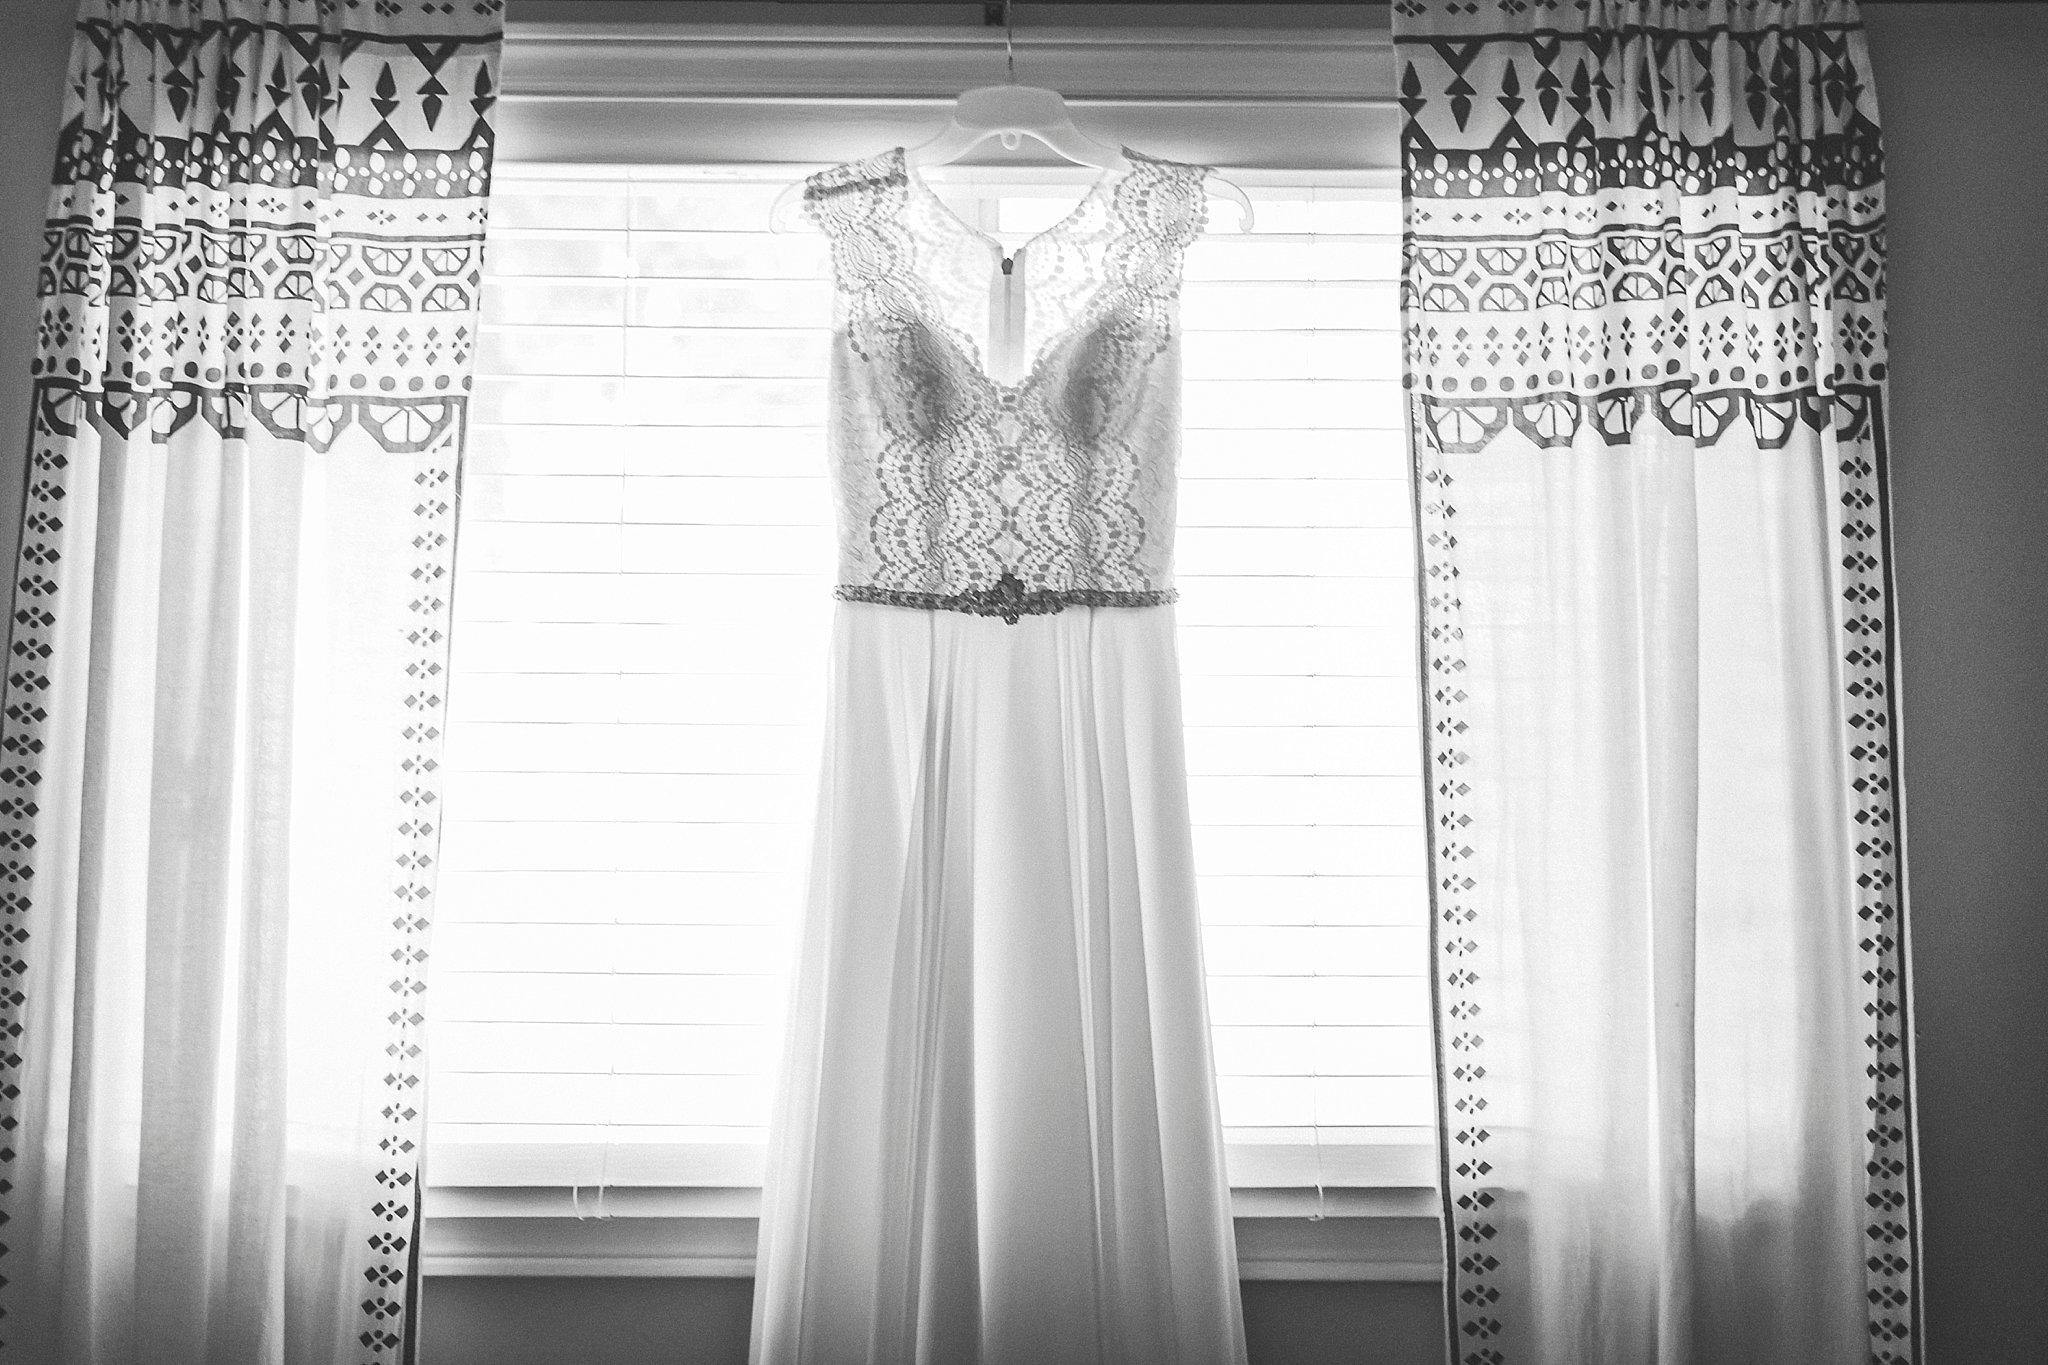 Wedding dress from The Bridal Salon in St. John's, Newfoundland